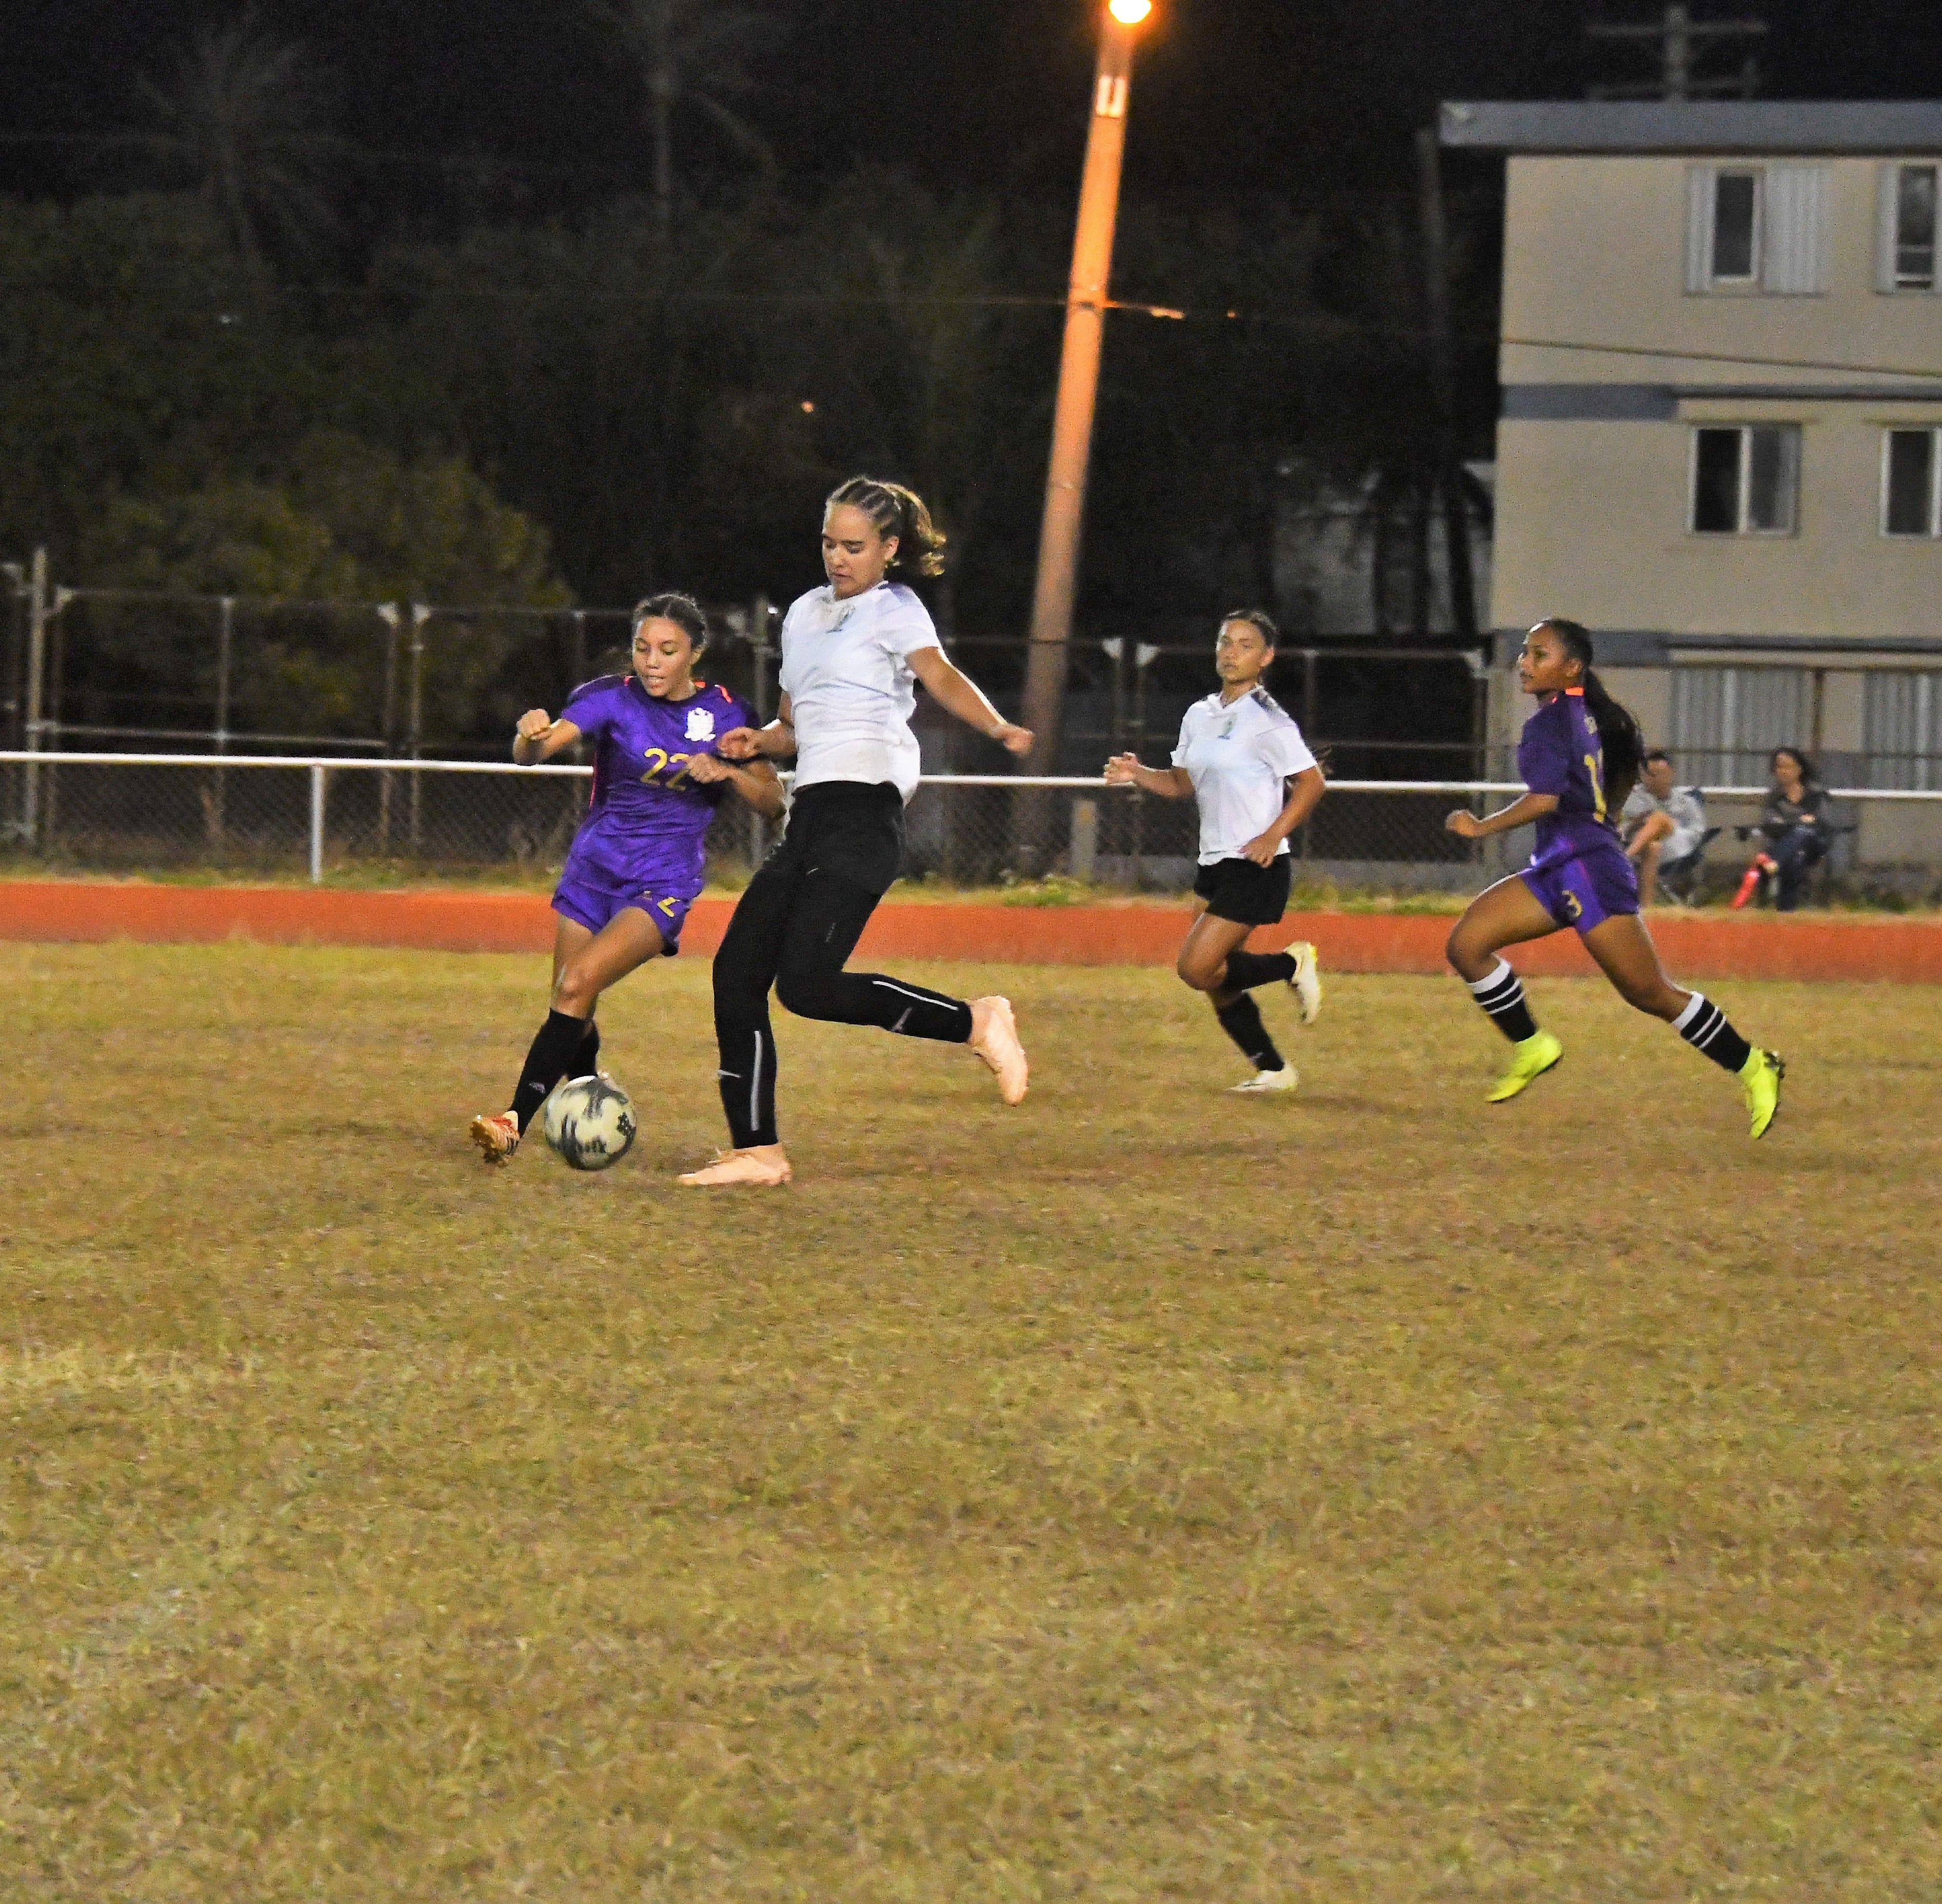 Academy Cougars blank GW Geckos 8-0 in girls soccer